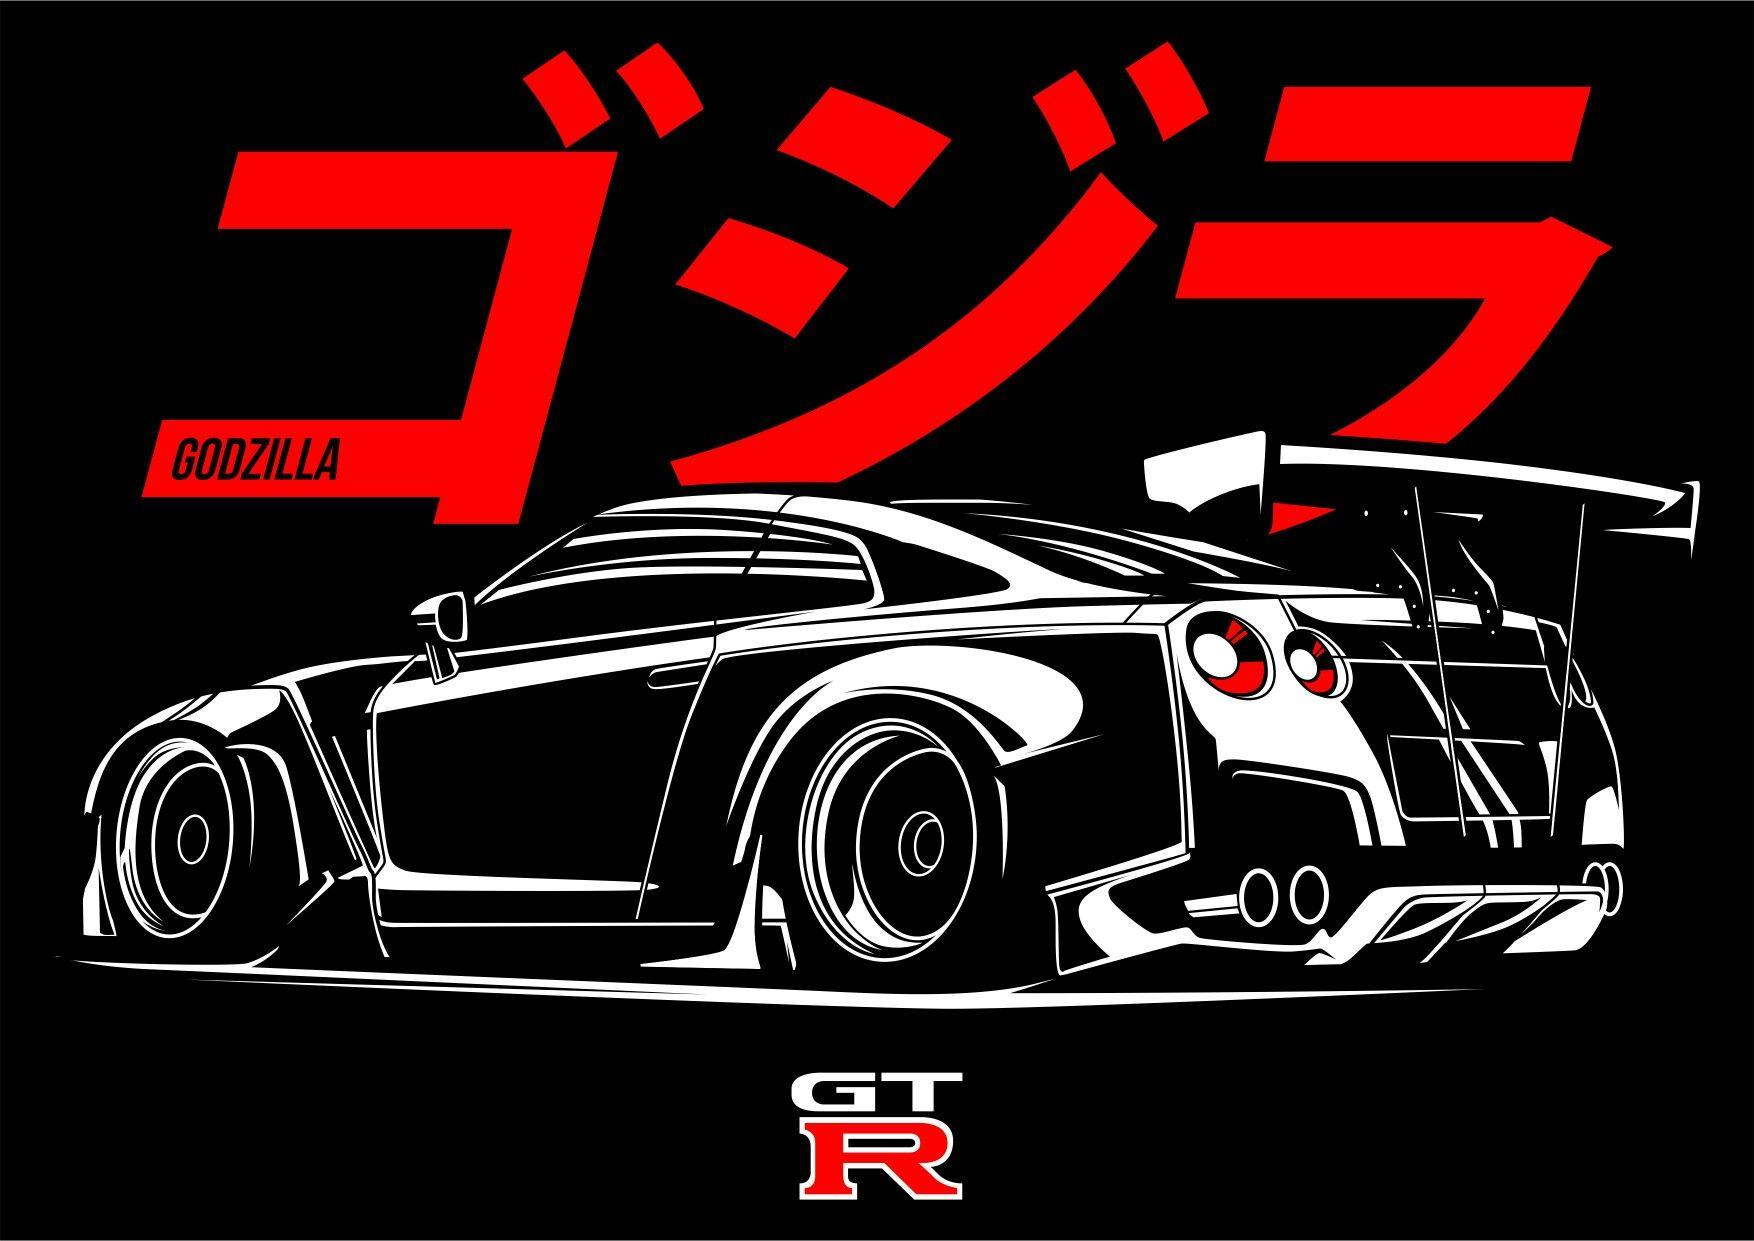 Godzilla Gtr Rocket Bunny Mobil Balap Mobil Sport Mobil